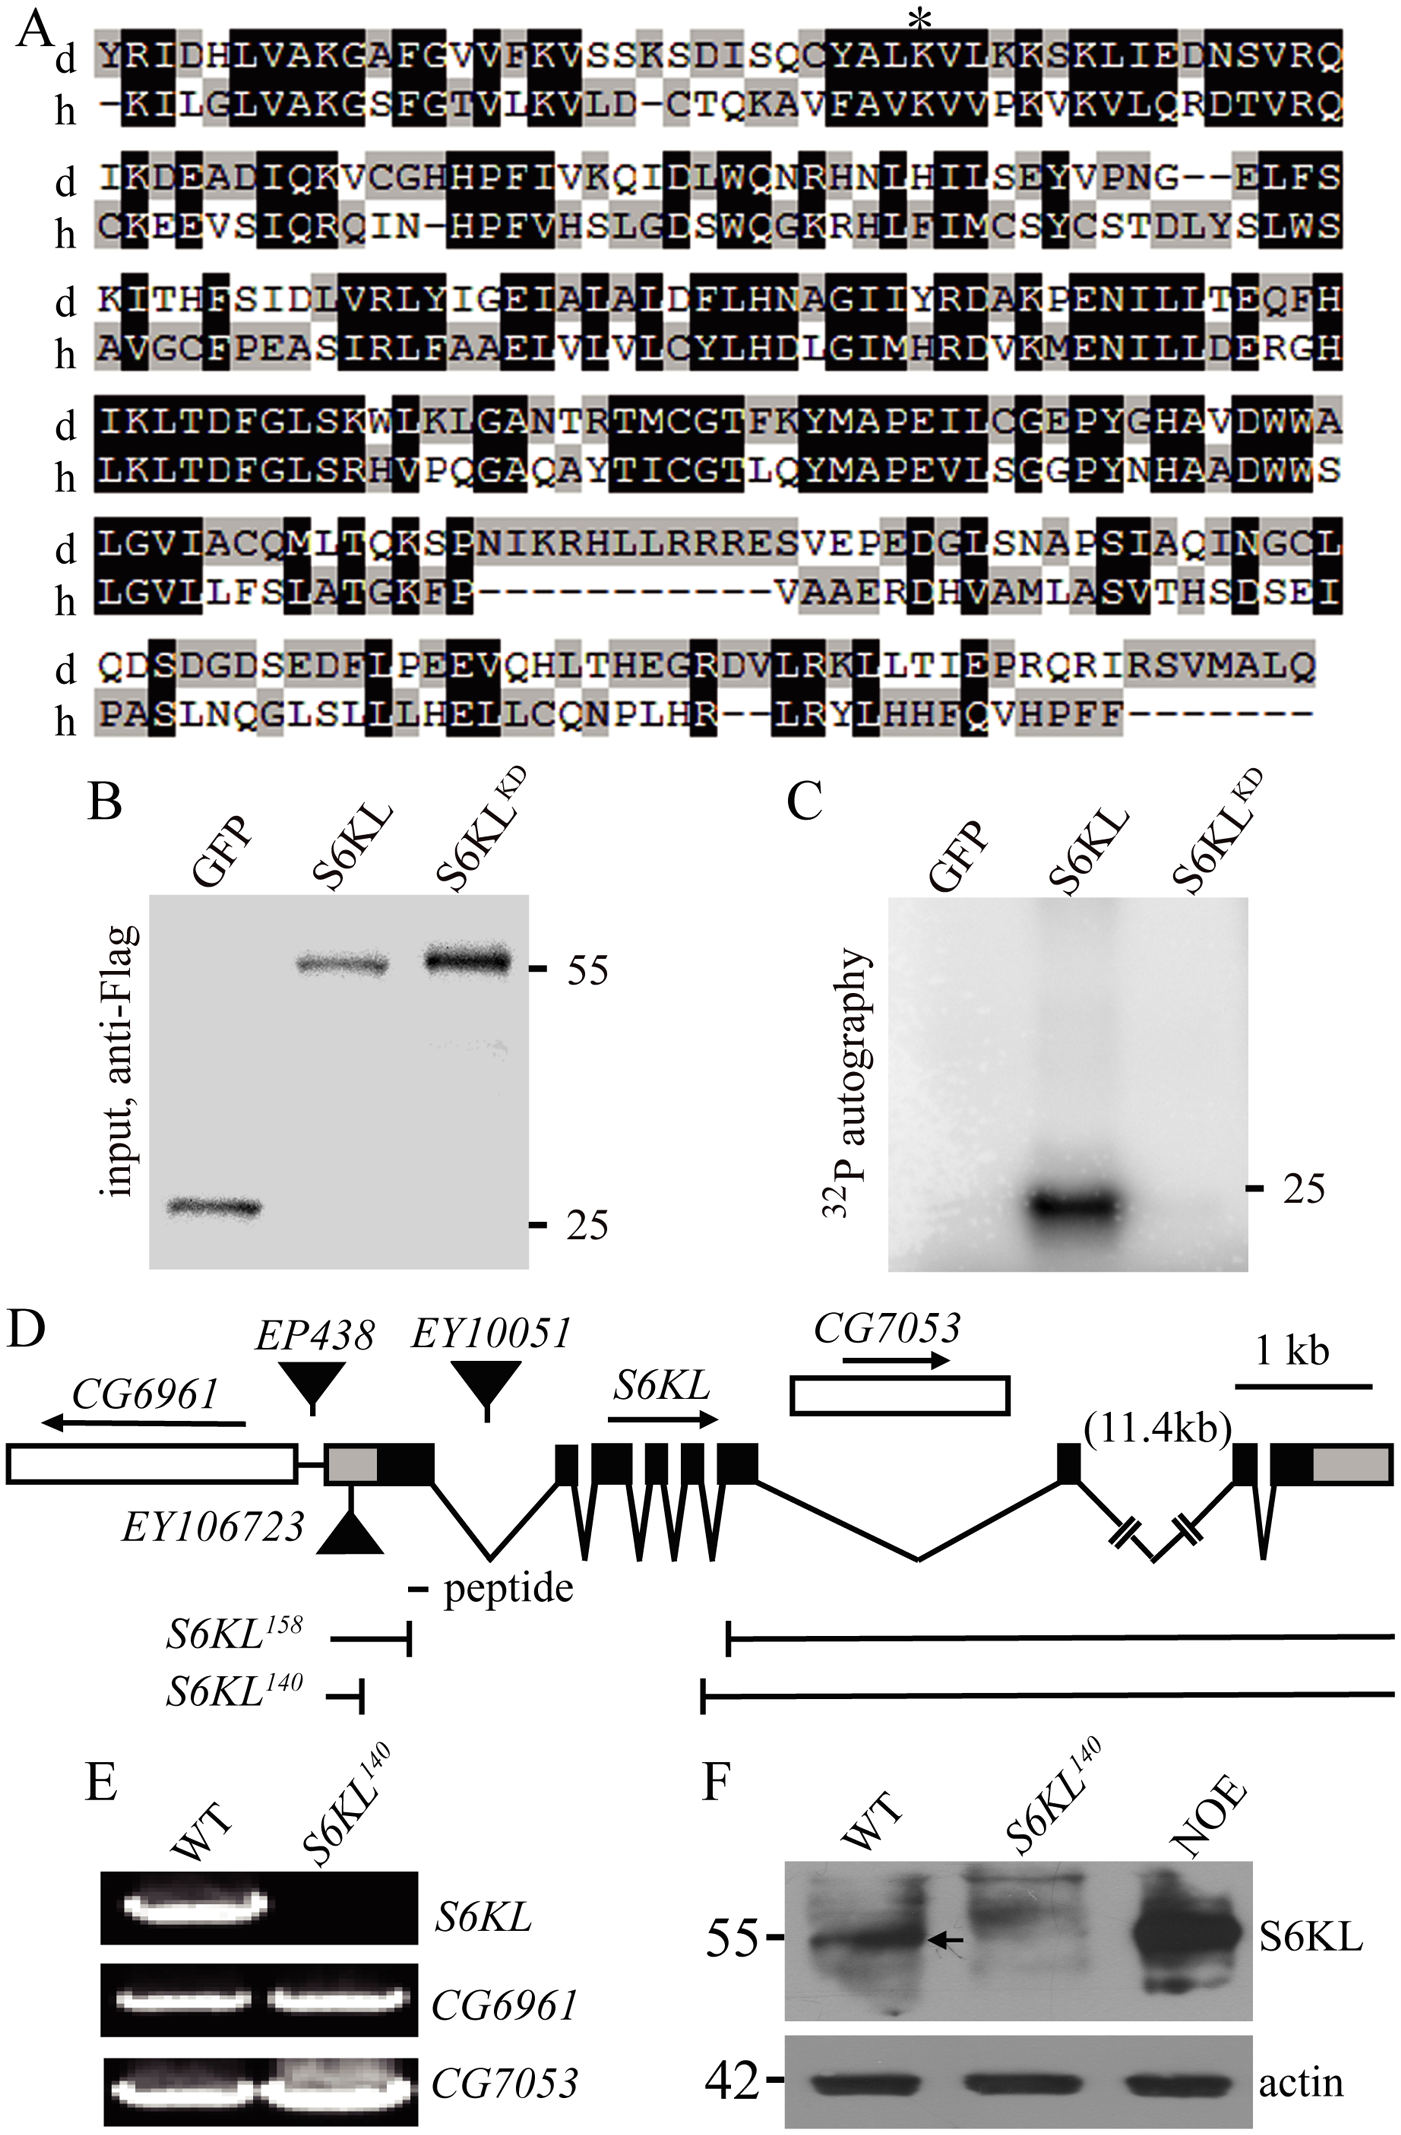 Kinase domain alignment of S6KL and its human homolog and molecular characterization of <i>S6KL</i> mutants.